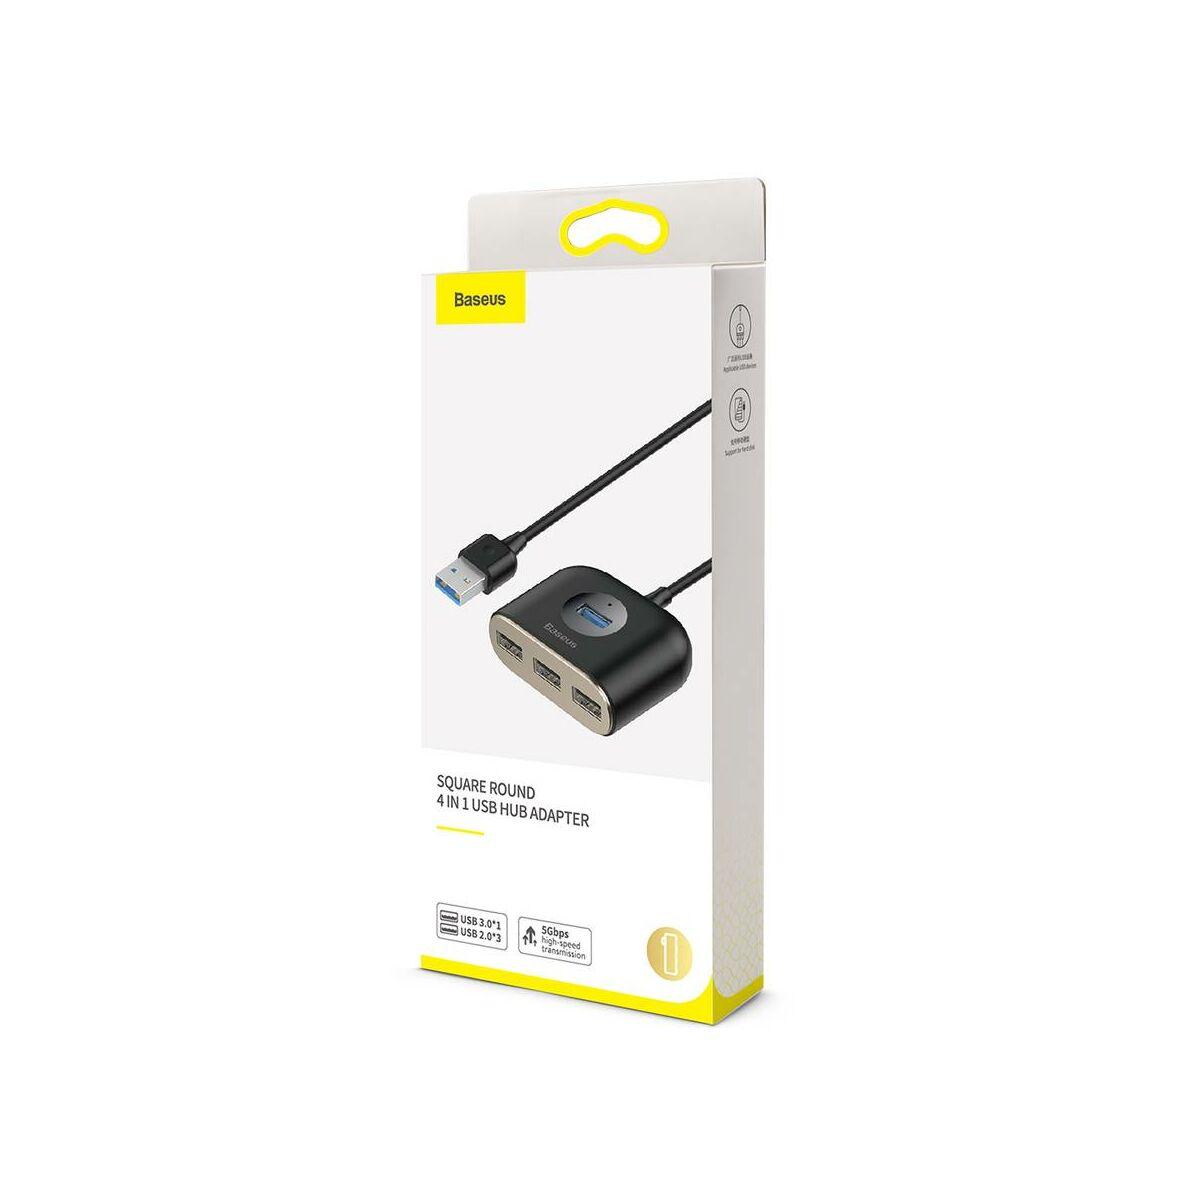 Baseus HUB, Square Round, 4-in-1 USB-A bemenetről USB Adapter USB3.0x1 + USB2.0x3 1m, fekete (CAHUB-AY01)